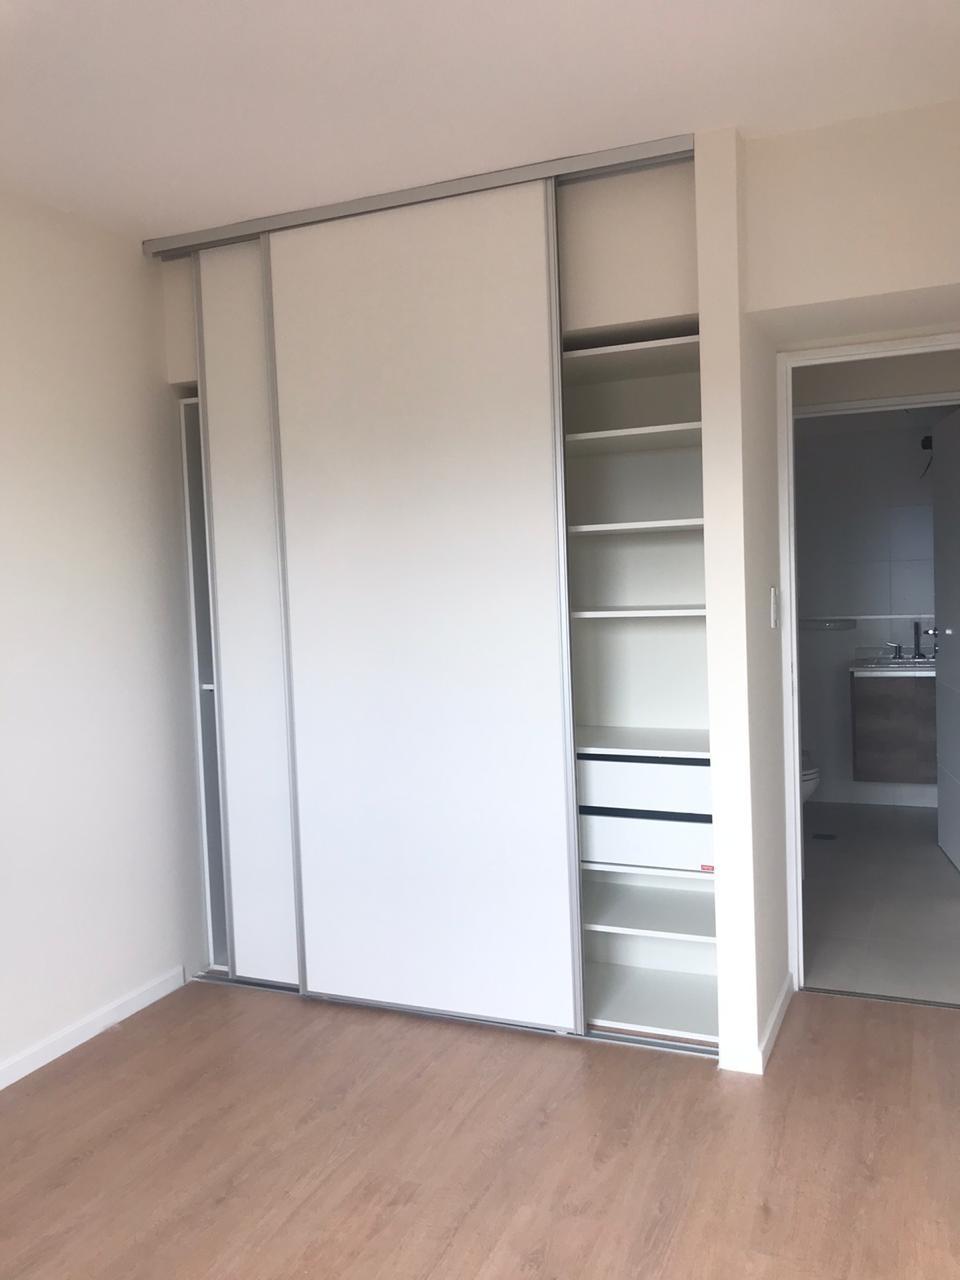 NQN015 - EXCELENTE DEPARTAMENTO de 108,67 m2